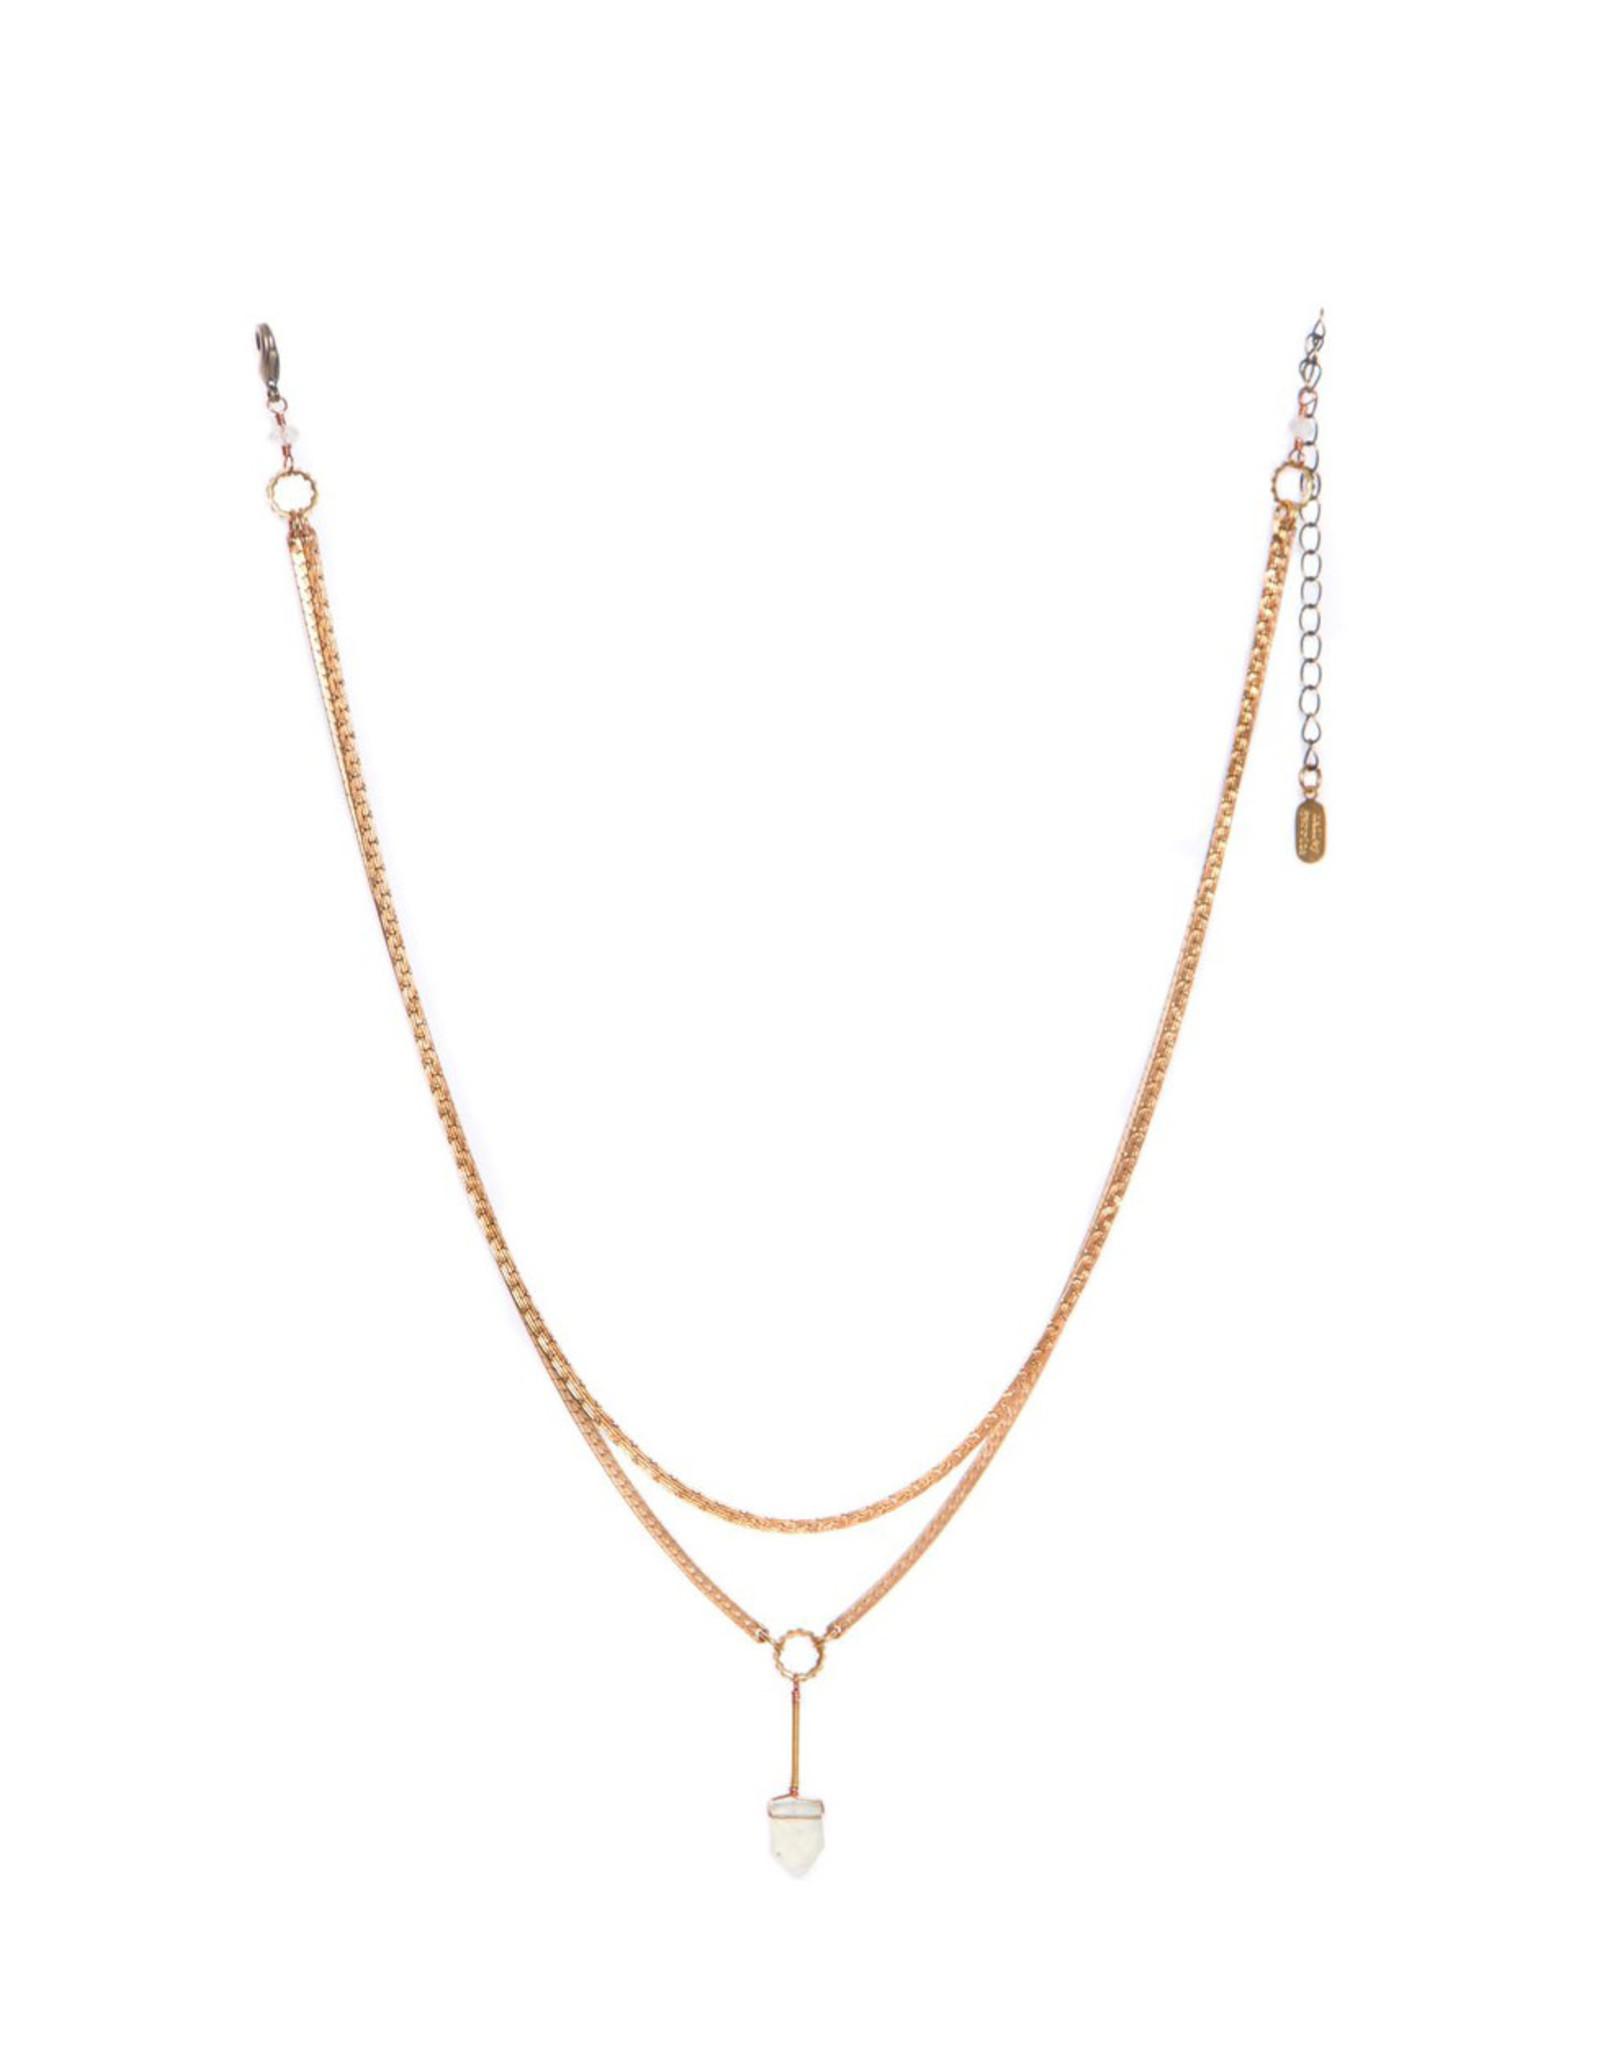 Hailey Gerrits Designs Fern Necklace - Prehnite